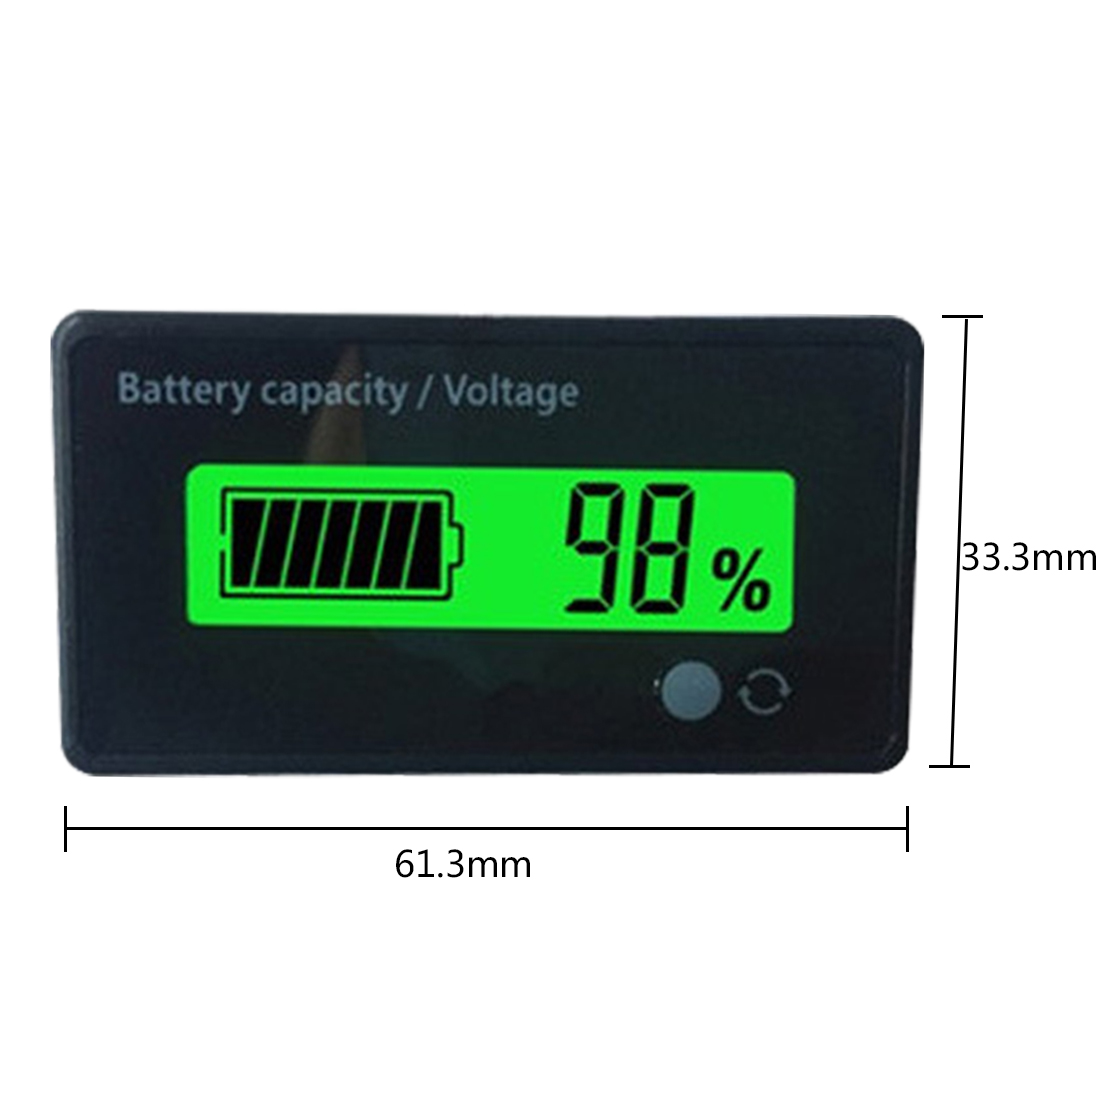 1pc Lithium Battery Capacity Indicator Voltage Tester Power Meter LCD Digital Voltmeter for 12V/24V/36V/48V Acid Lead 1 2v to 12v li ion lithium battery capacity tester resistance lead acid battery capacity meter protection voltage ammeter yx